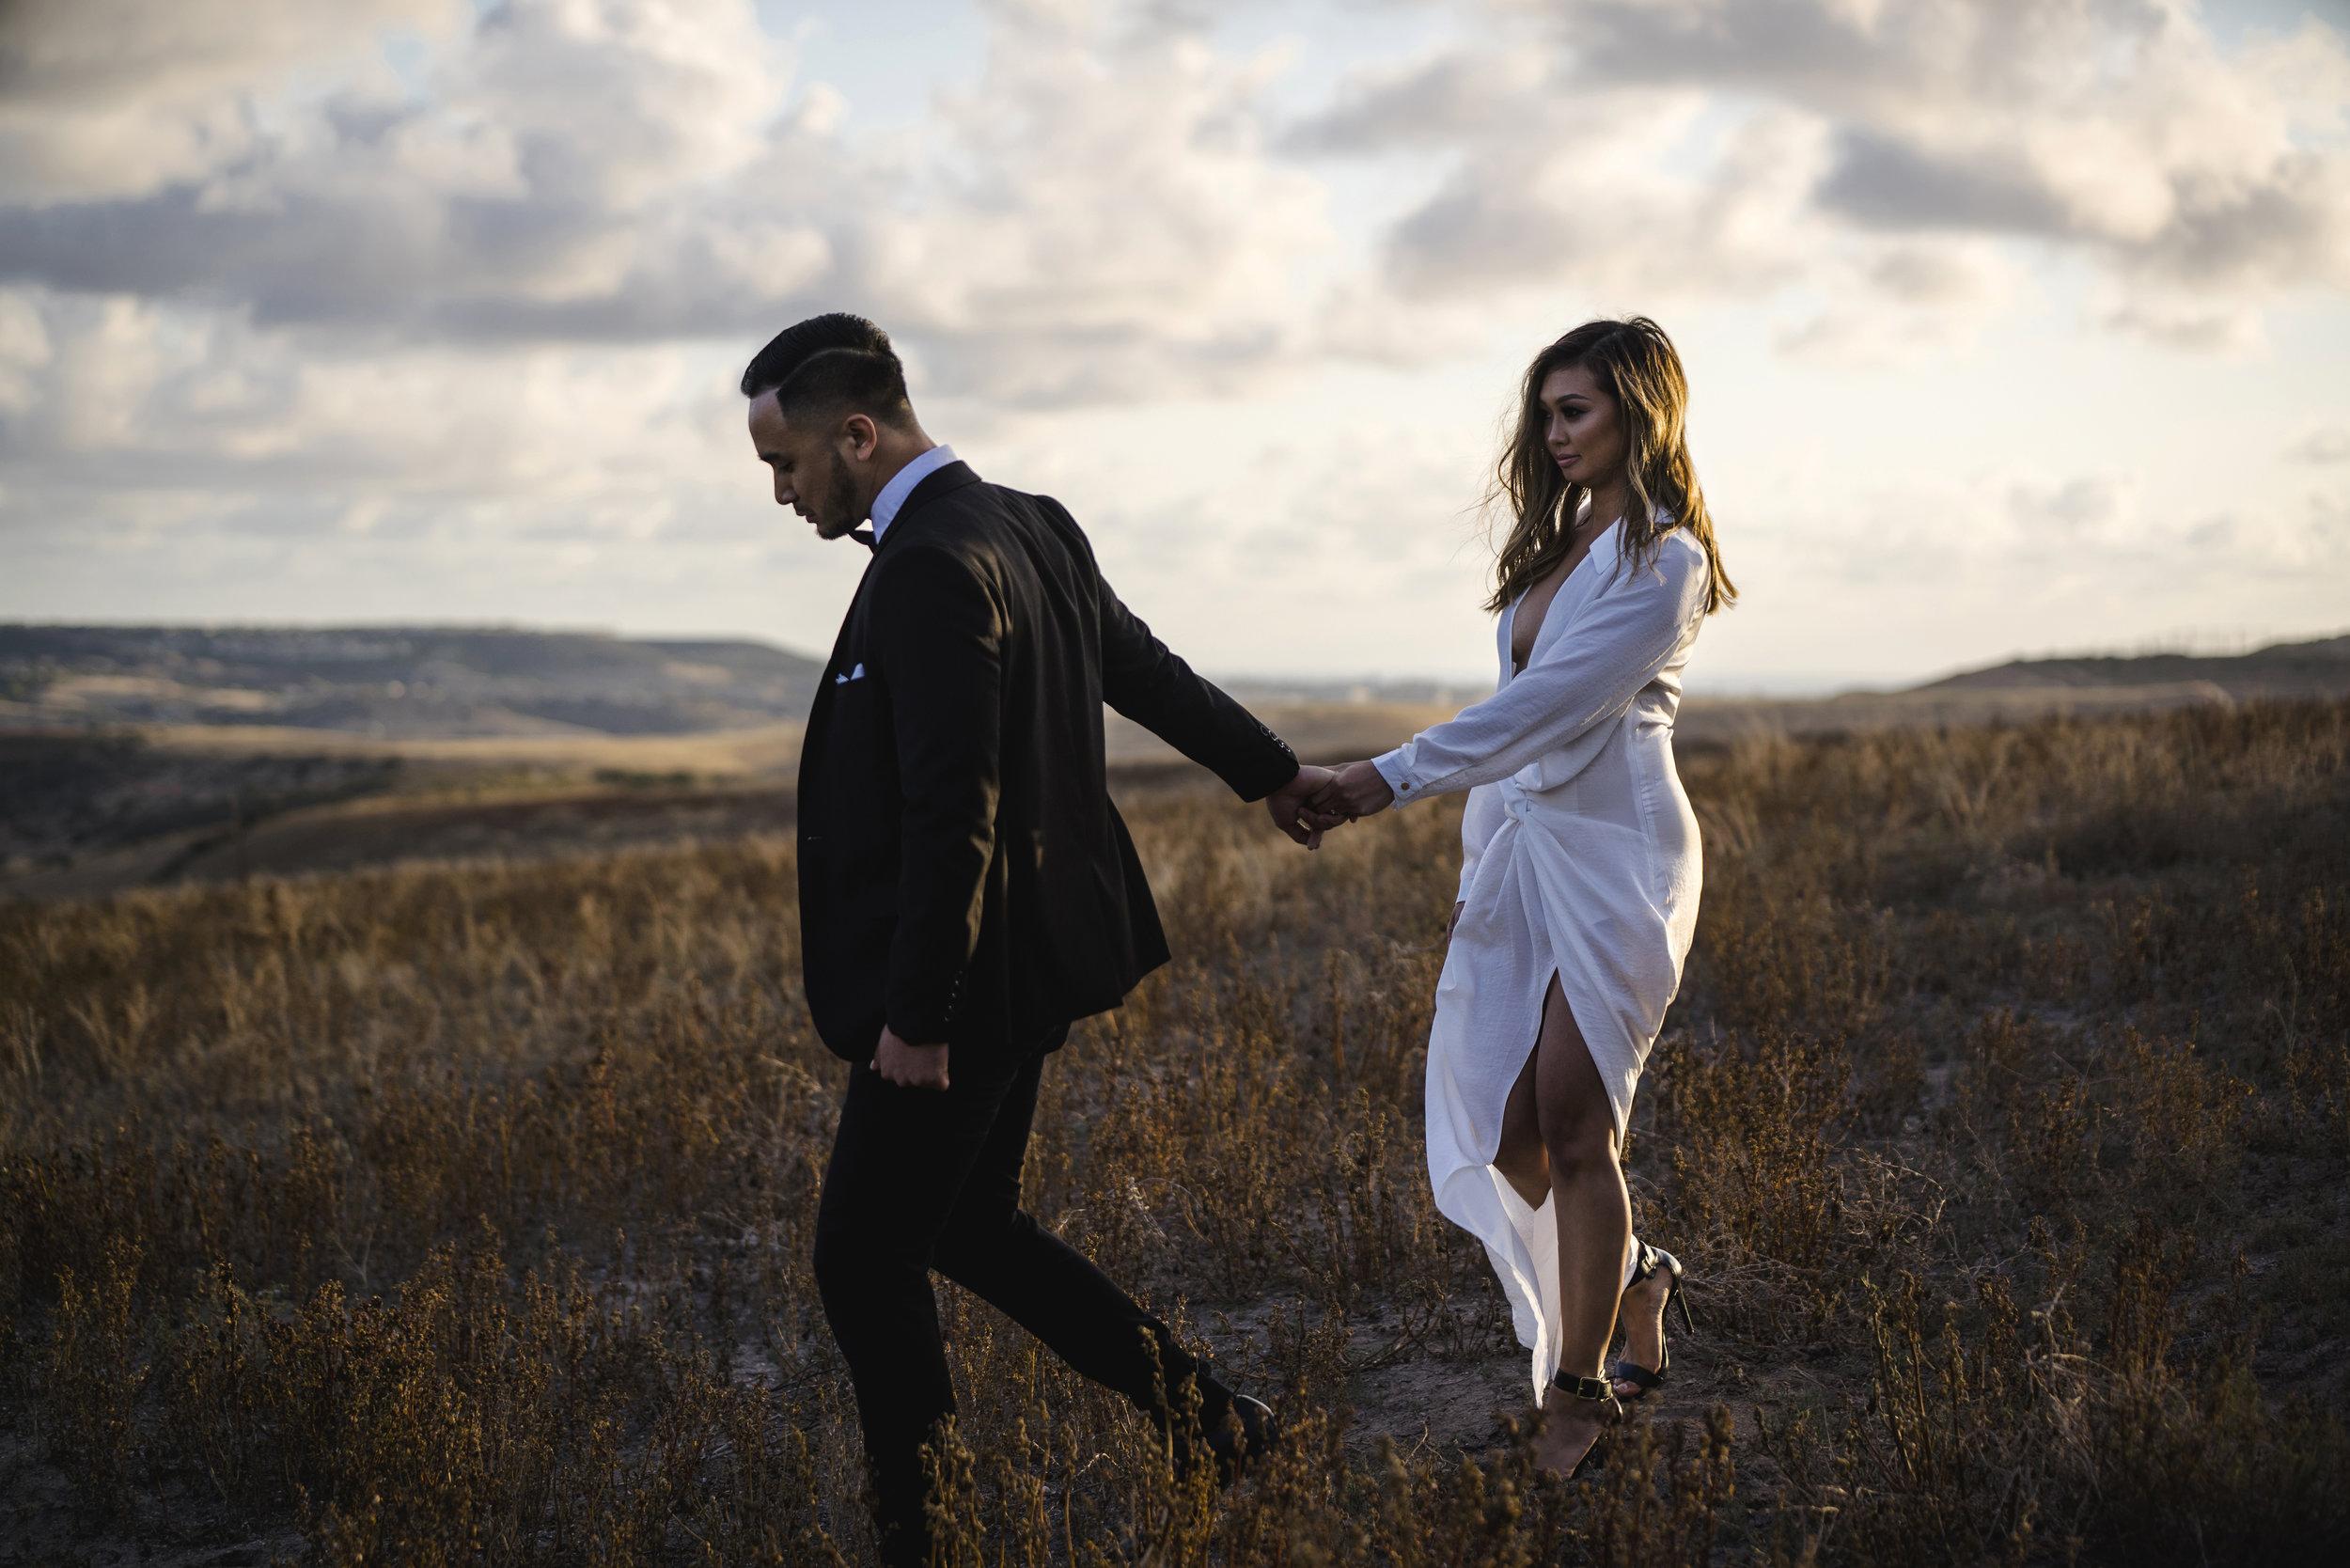 Angela + Theo Engagement Photoshoot_86 60%.jpg